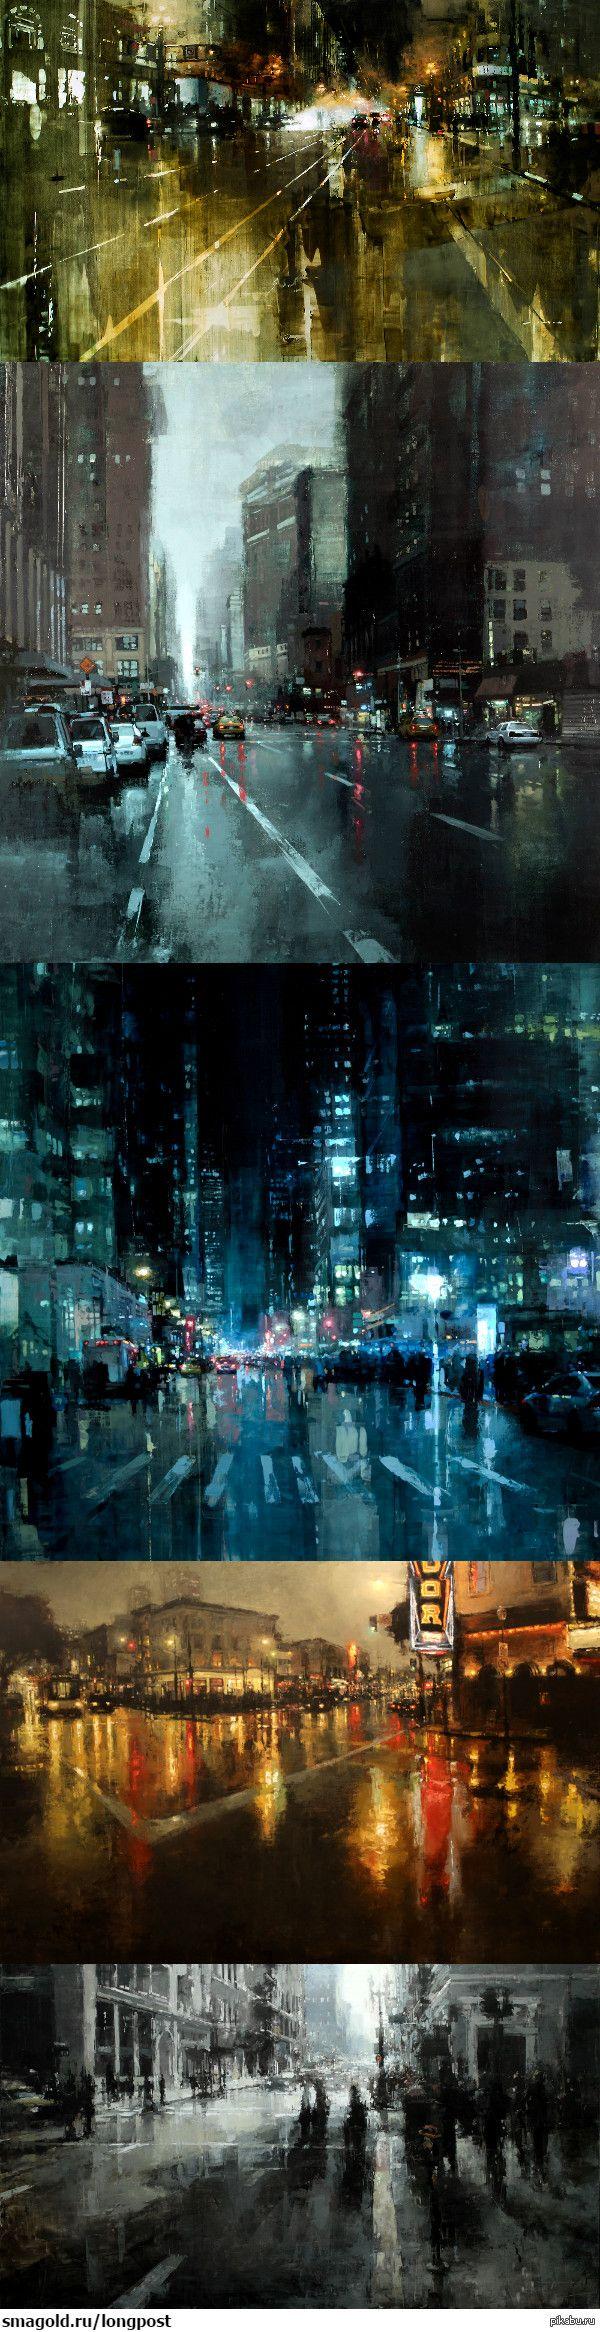 Jeremy Mann Источник - http://redrabbit7.com/  картинки, арт, рисунок, длиннопост